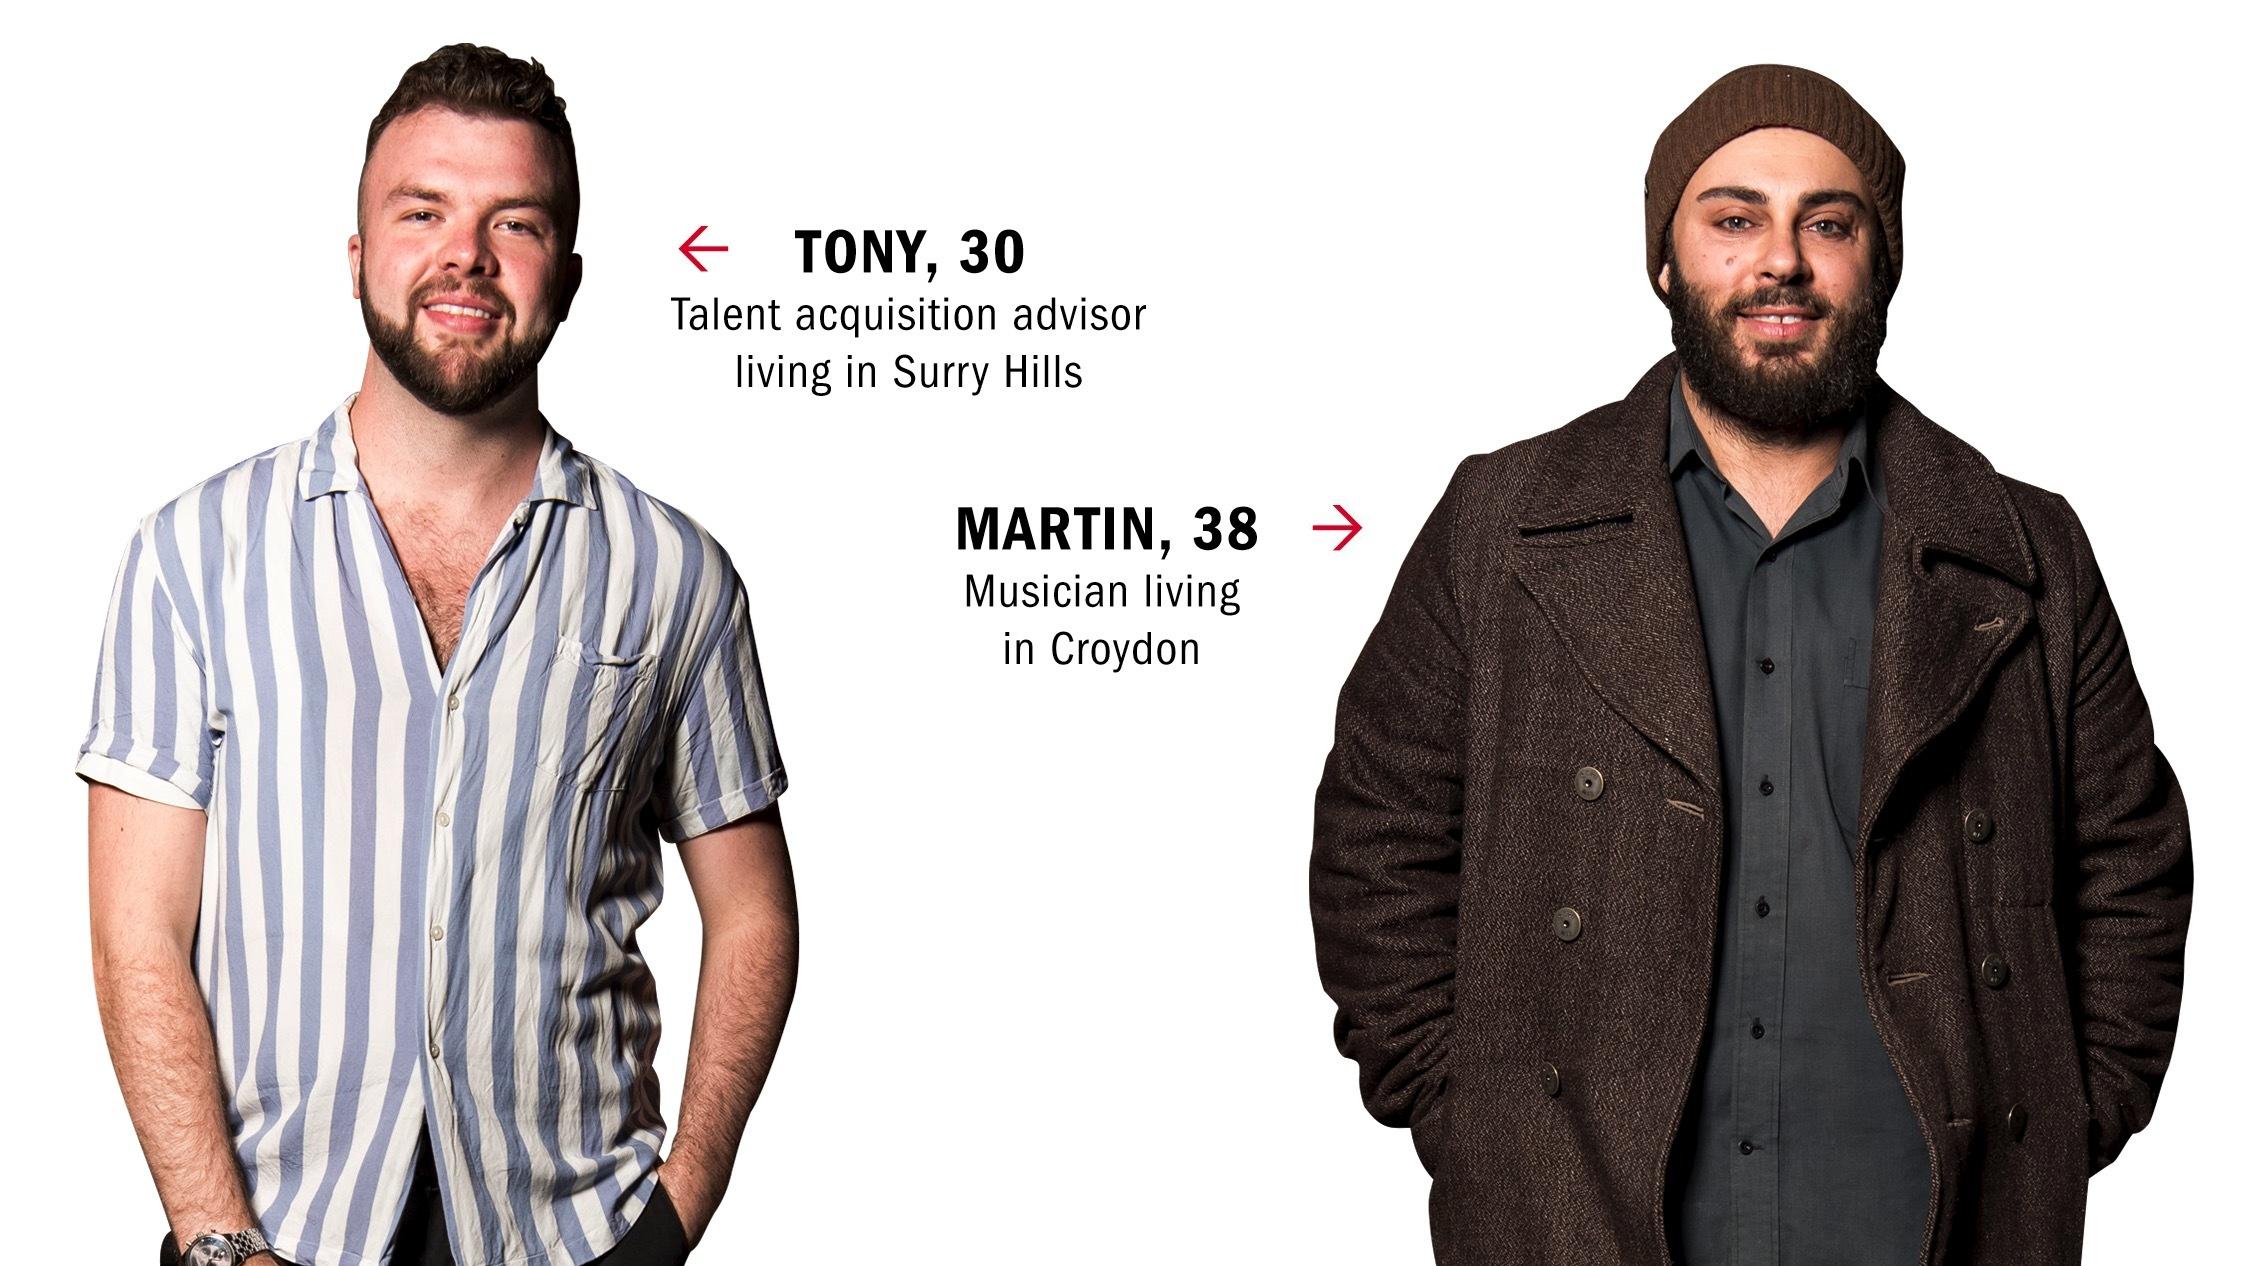 Dating IRL: Martin and Tony